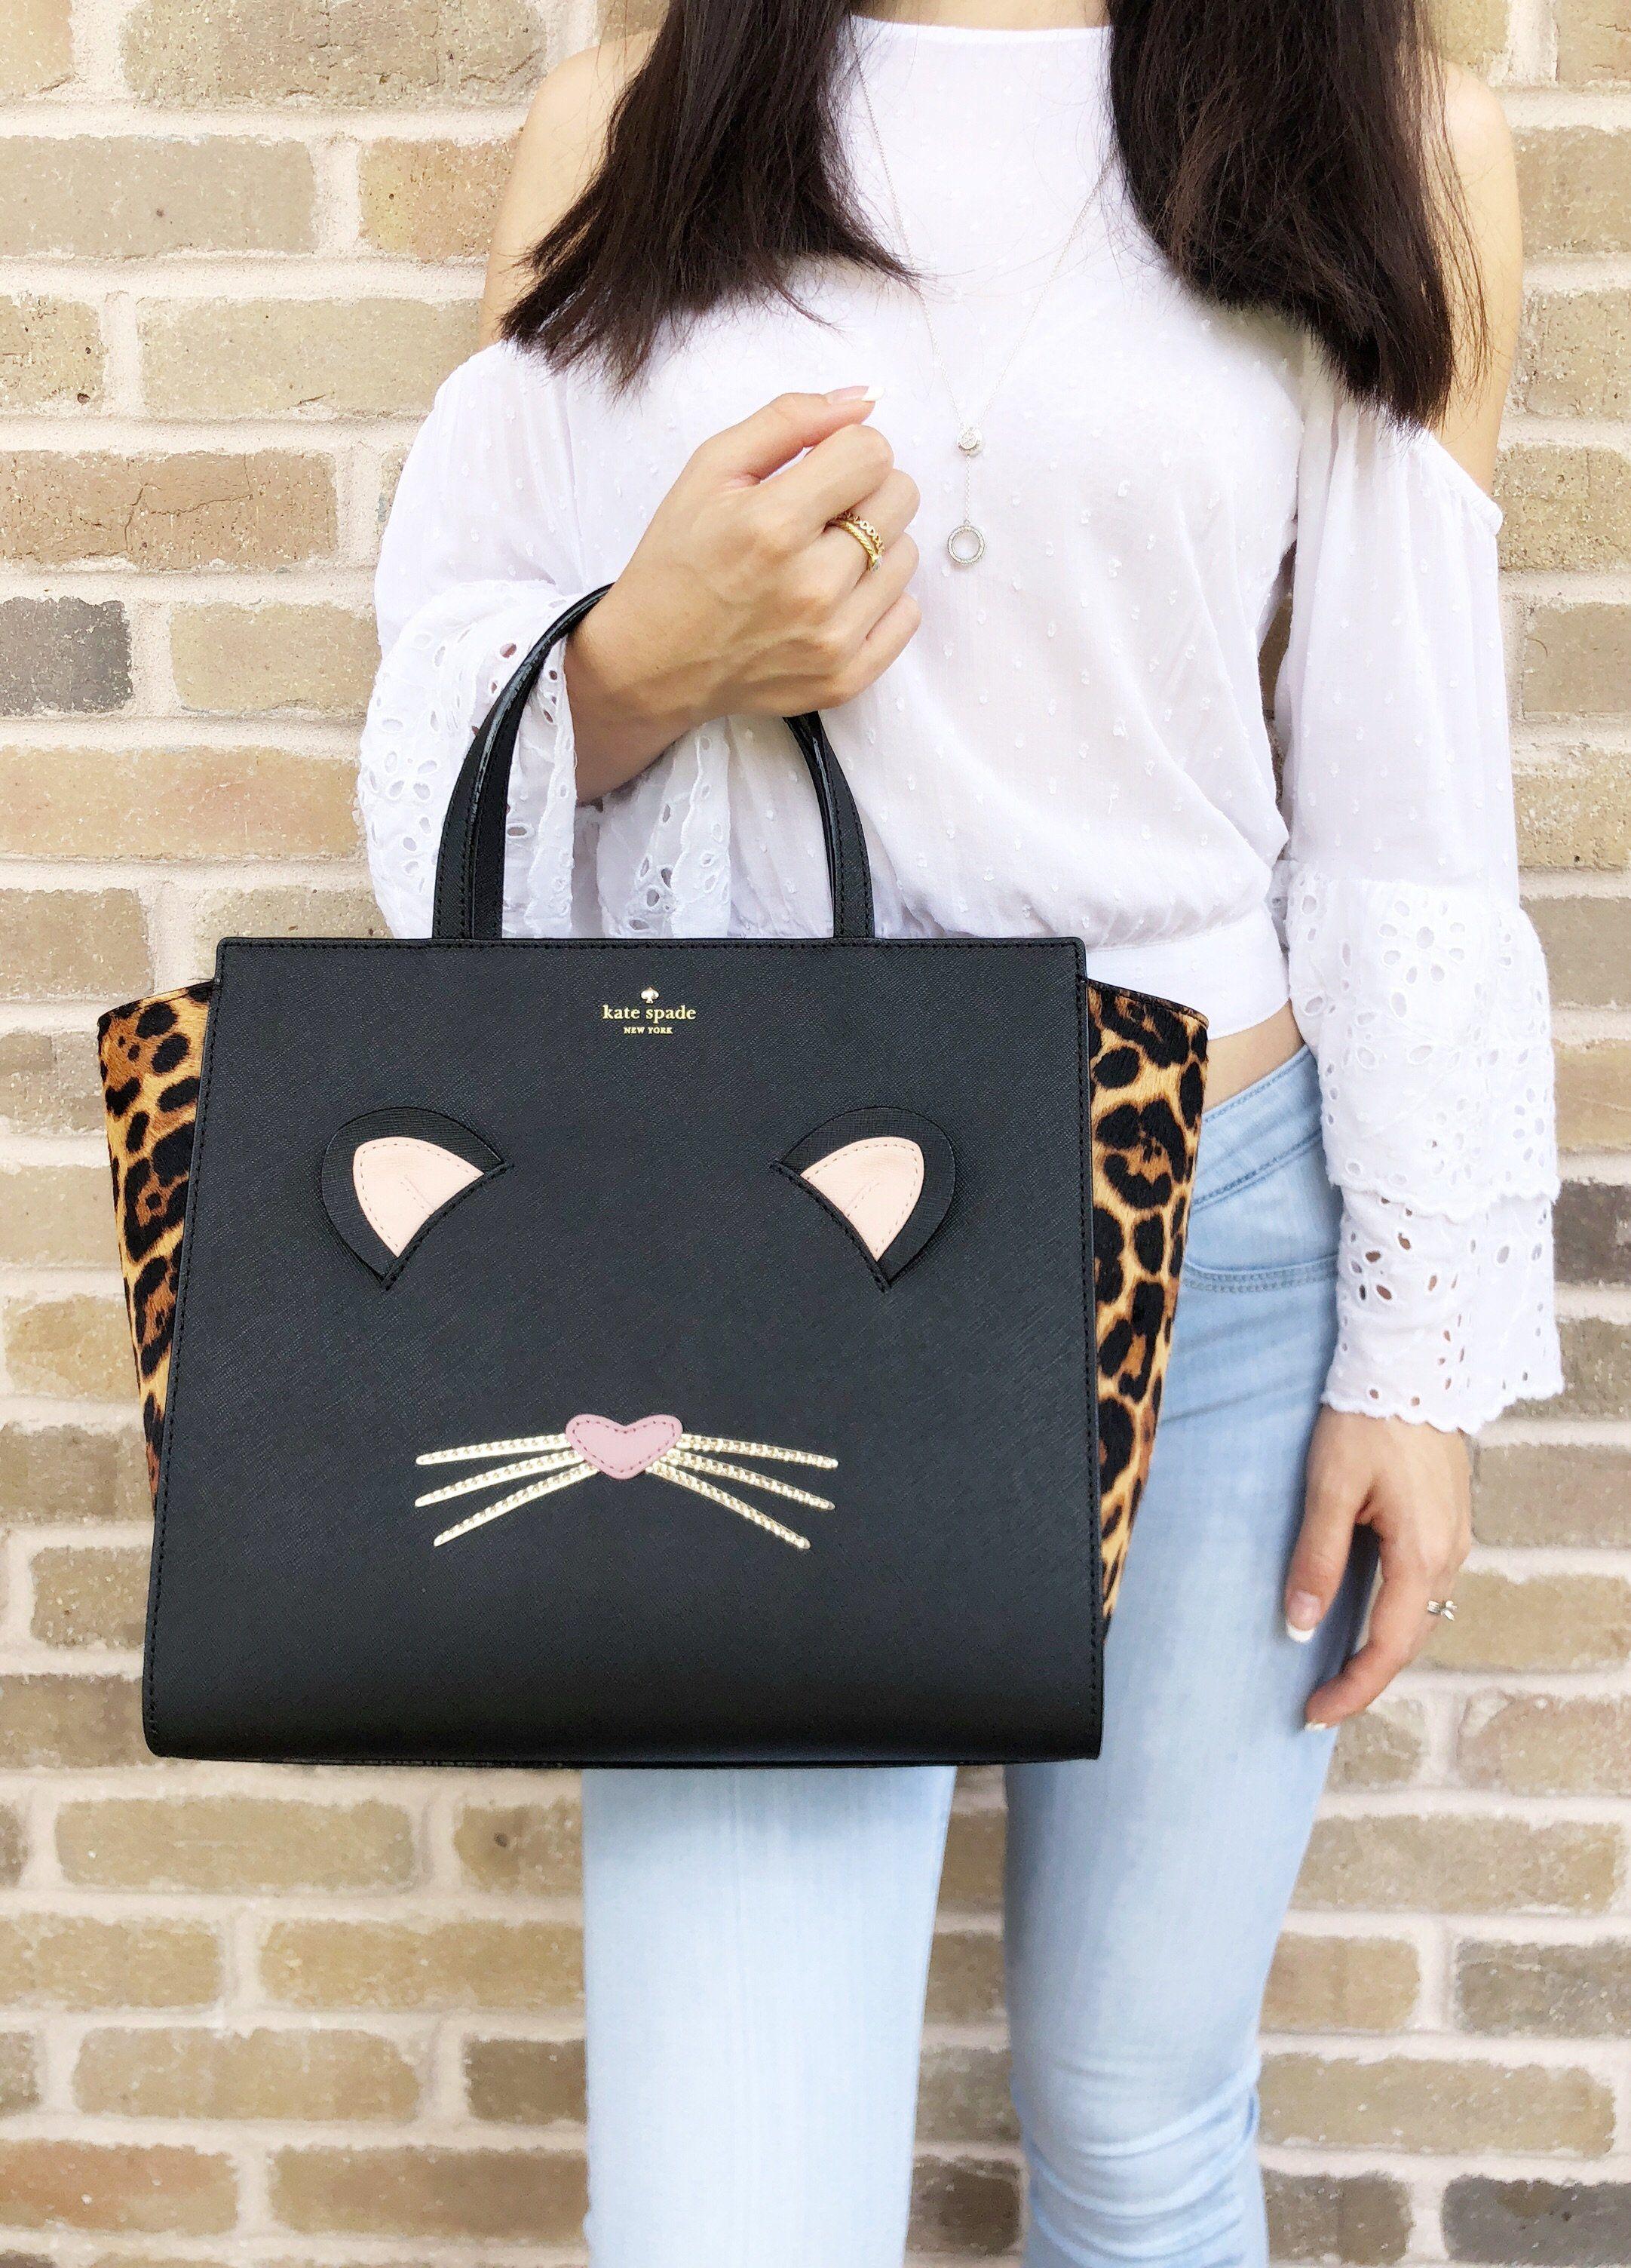 66eb095c2c55 Kate spade Leopard Hayden Run Wild Cat Large Satchel Bag Crossbody #Handbags  #GabysBags